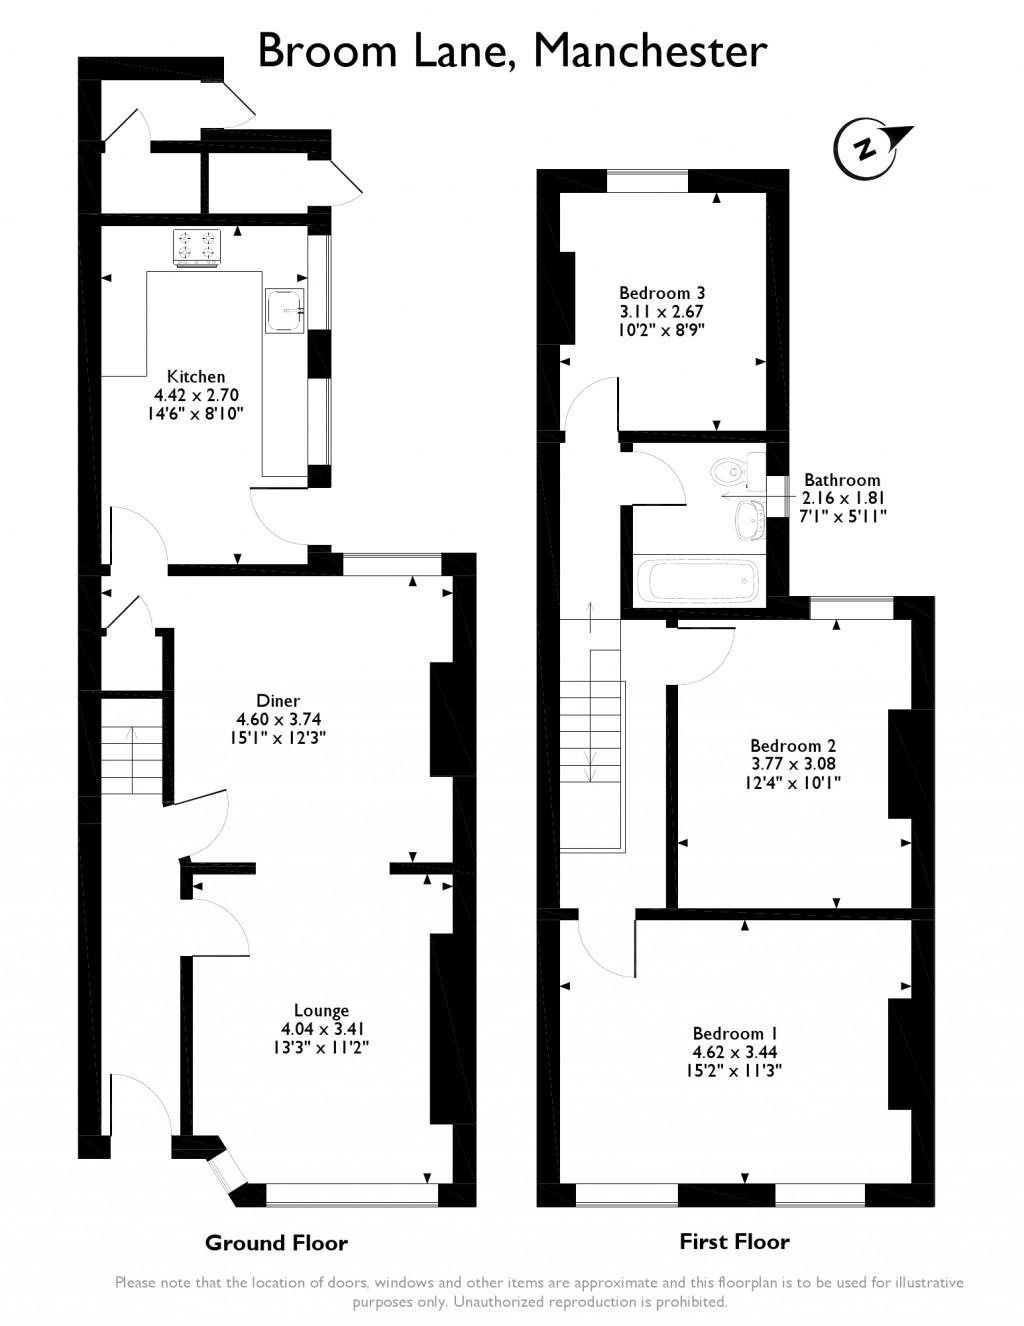 Broom Lane, Manchester, Greater Manchester M19, 3 bedroom